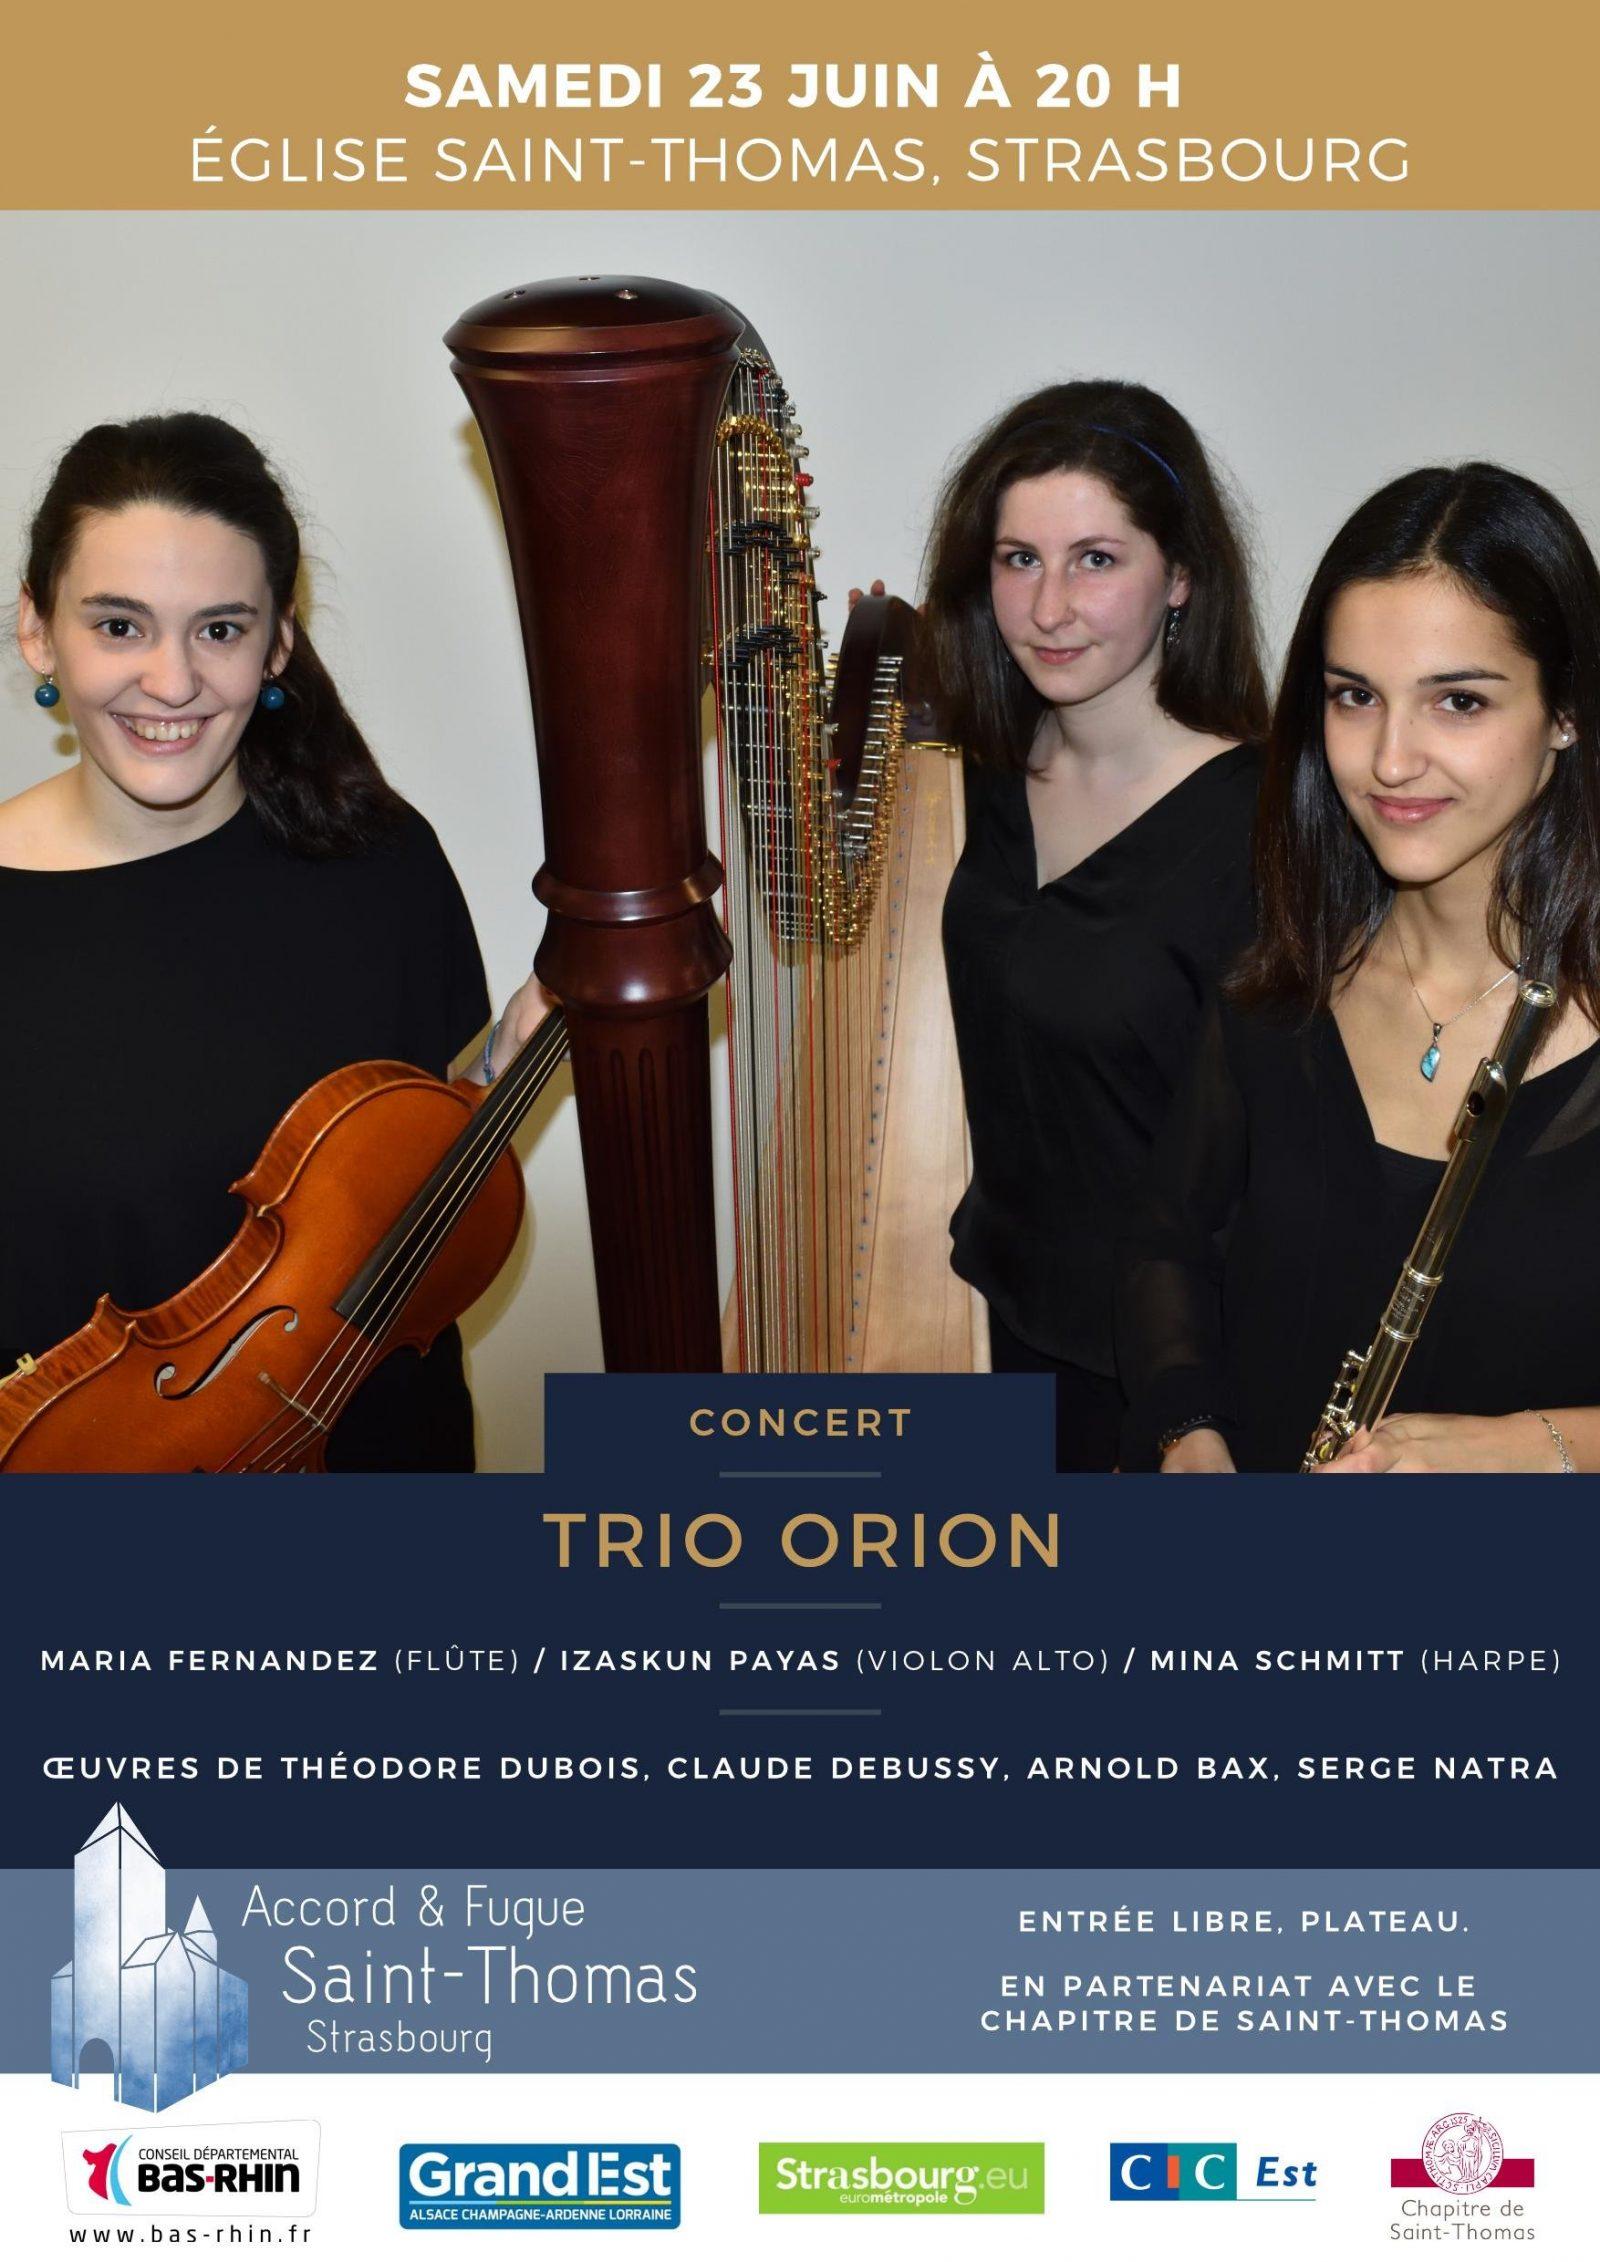 Concert Trio Orion Strasbourg